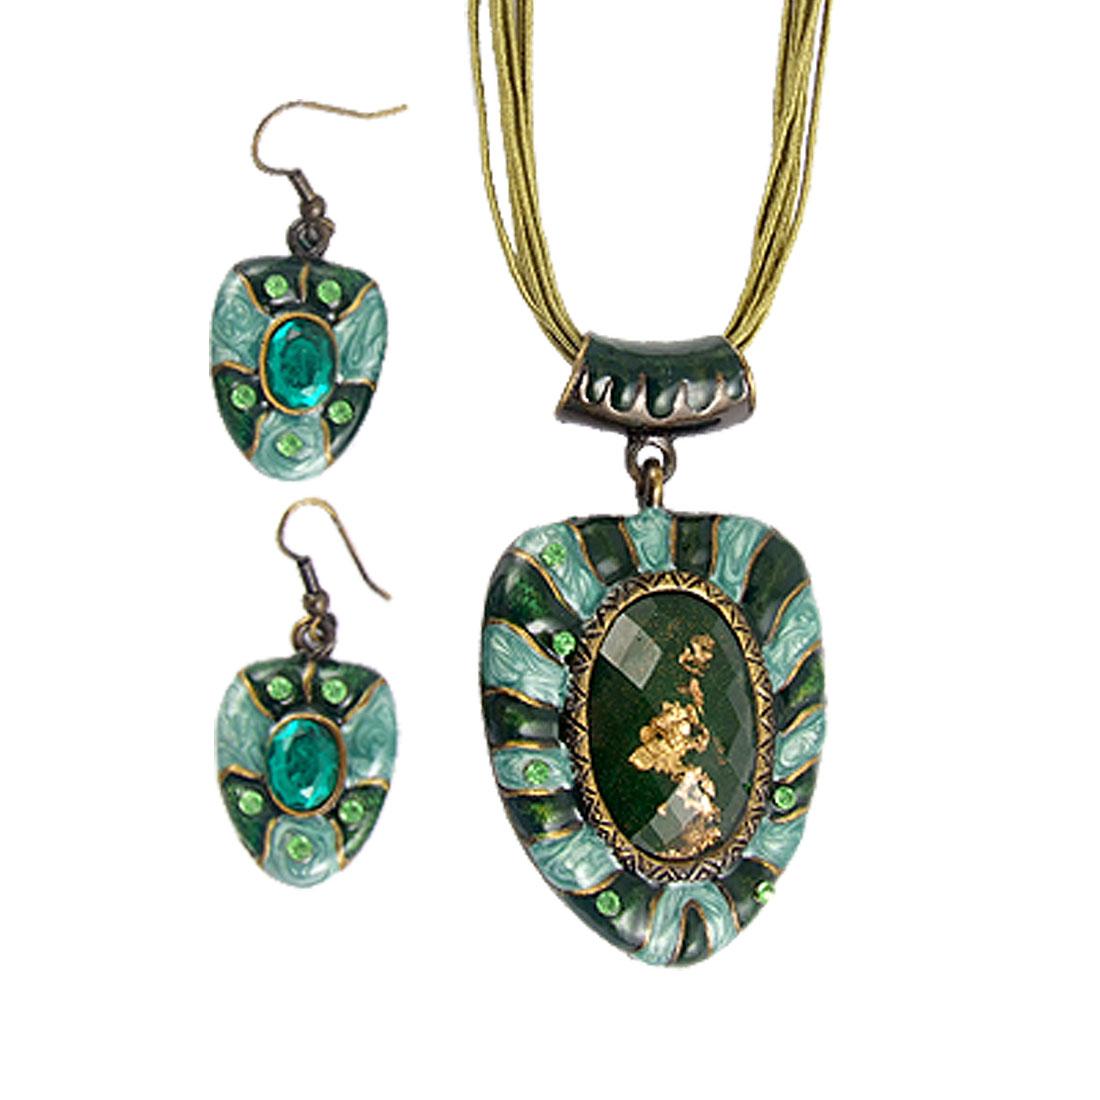 Lady Rhinestone Inlaid Cyan Necklace w Hook Earrings